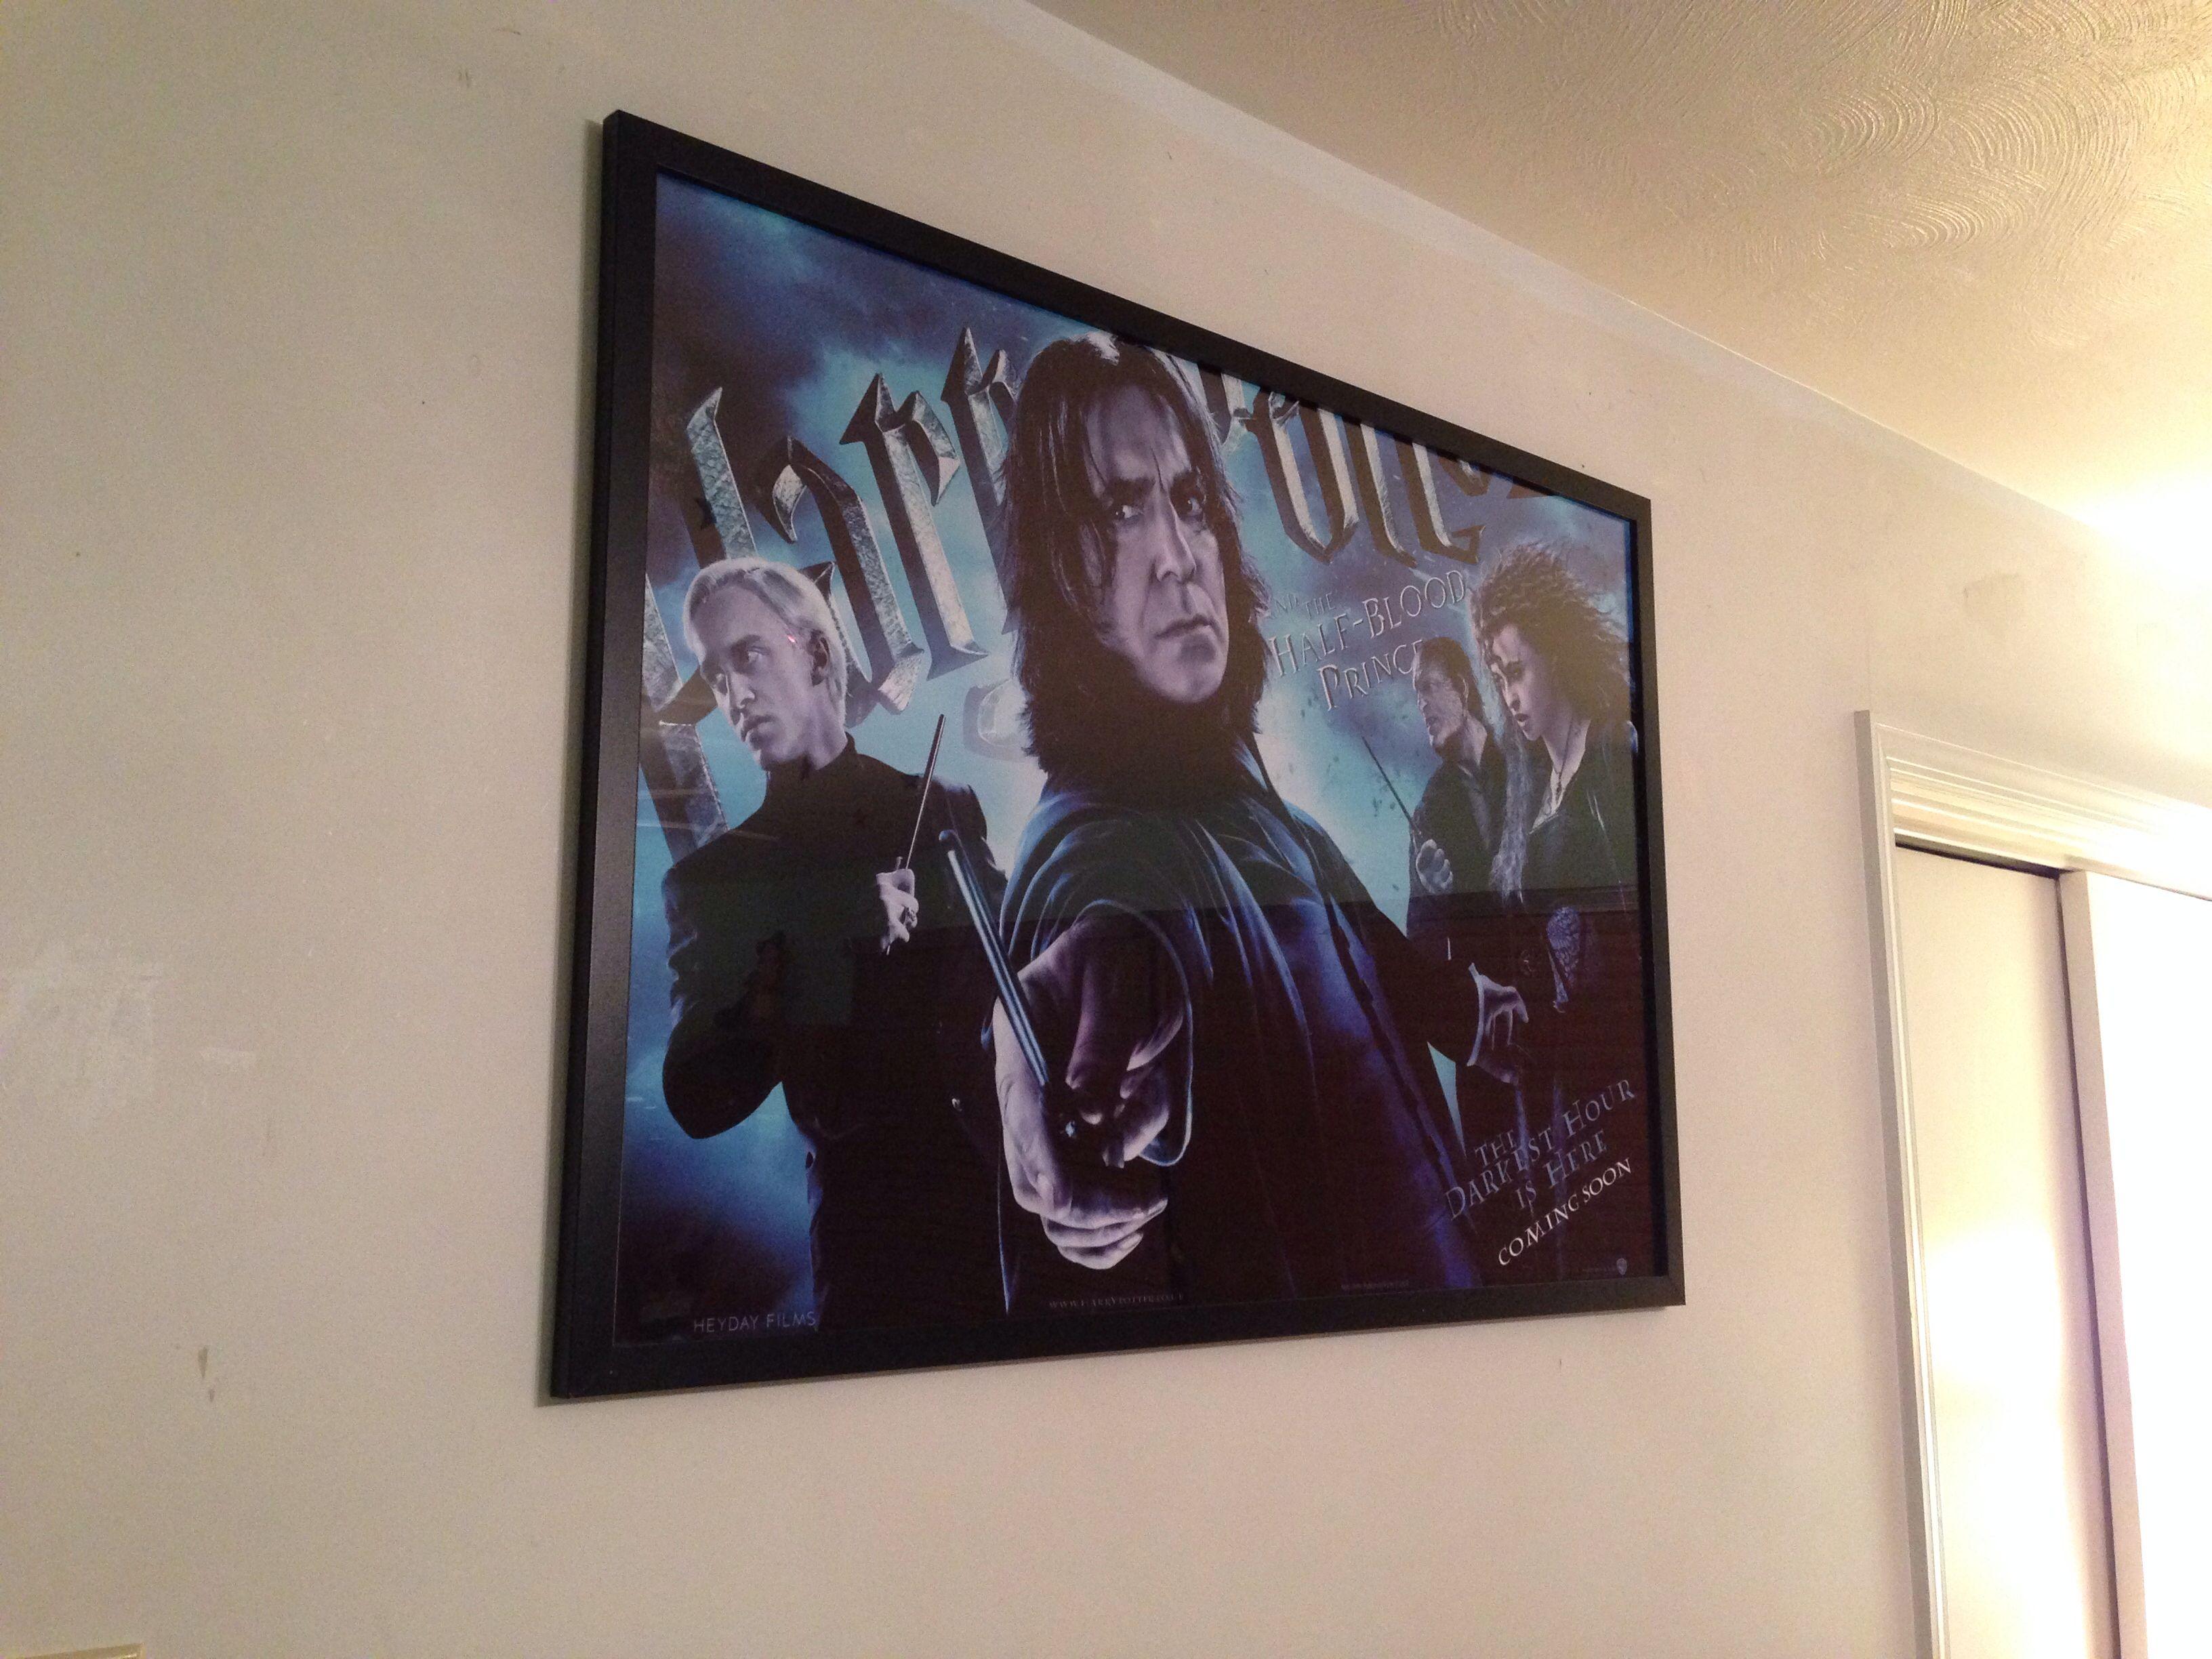 My new living room decor. Makes me smile. Love me some Severus Snape!